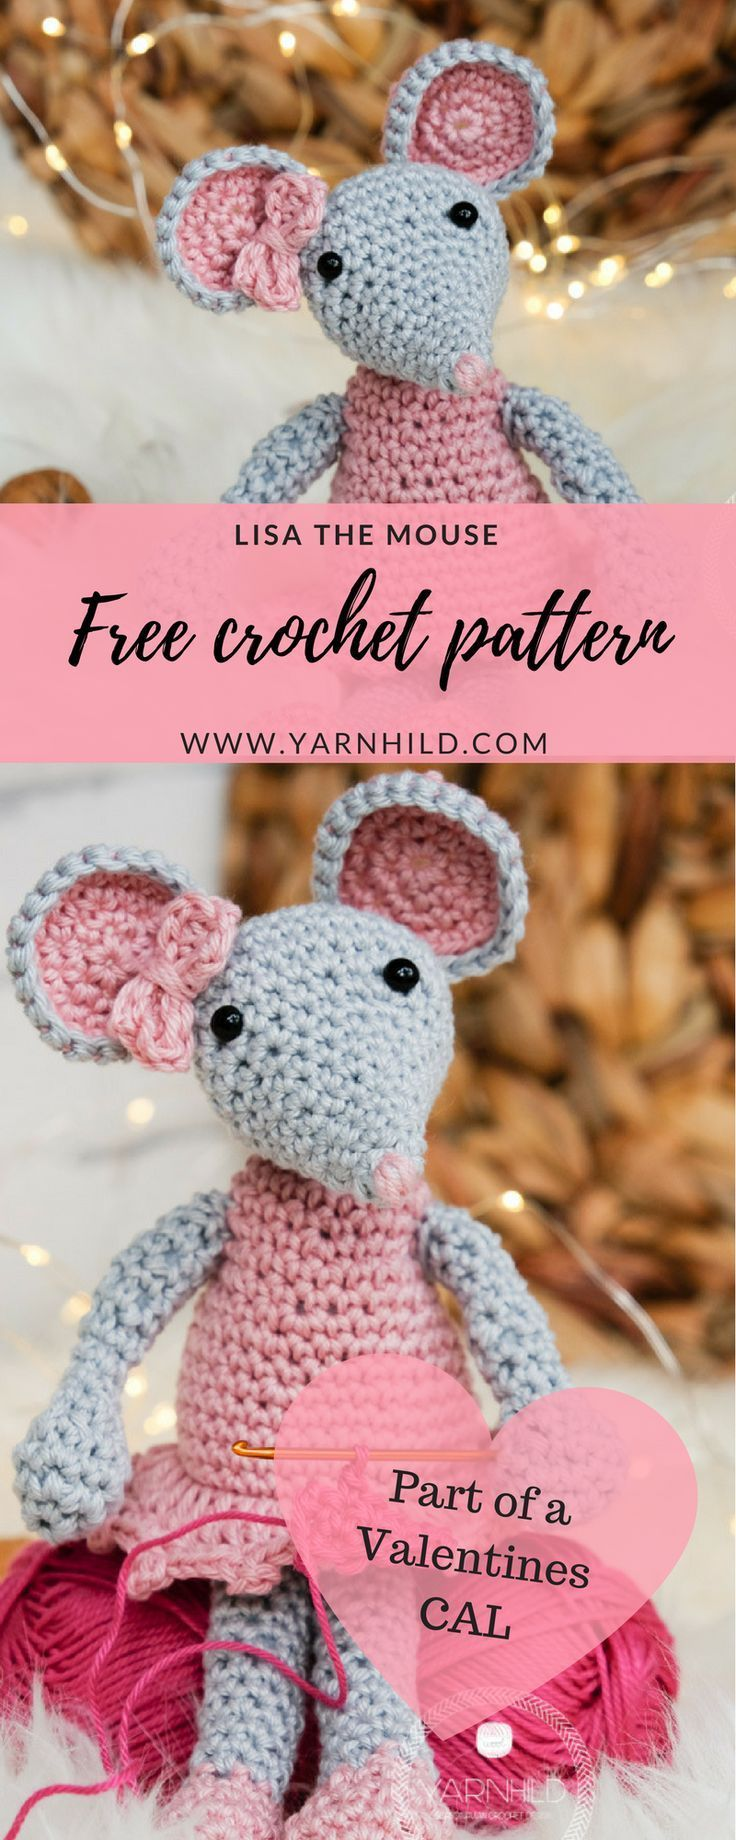 Lisa the crochet mouse - A free crochet pattern | Pinterest | Häkeln